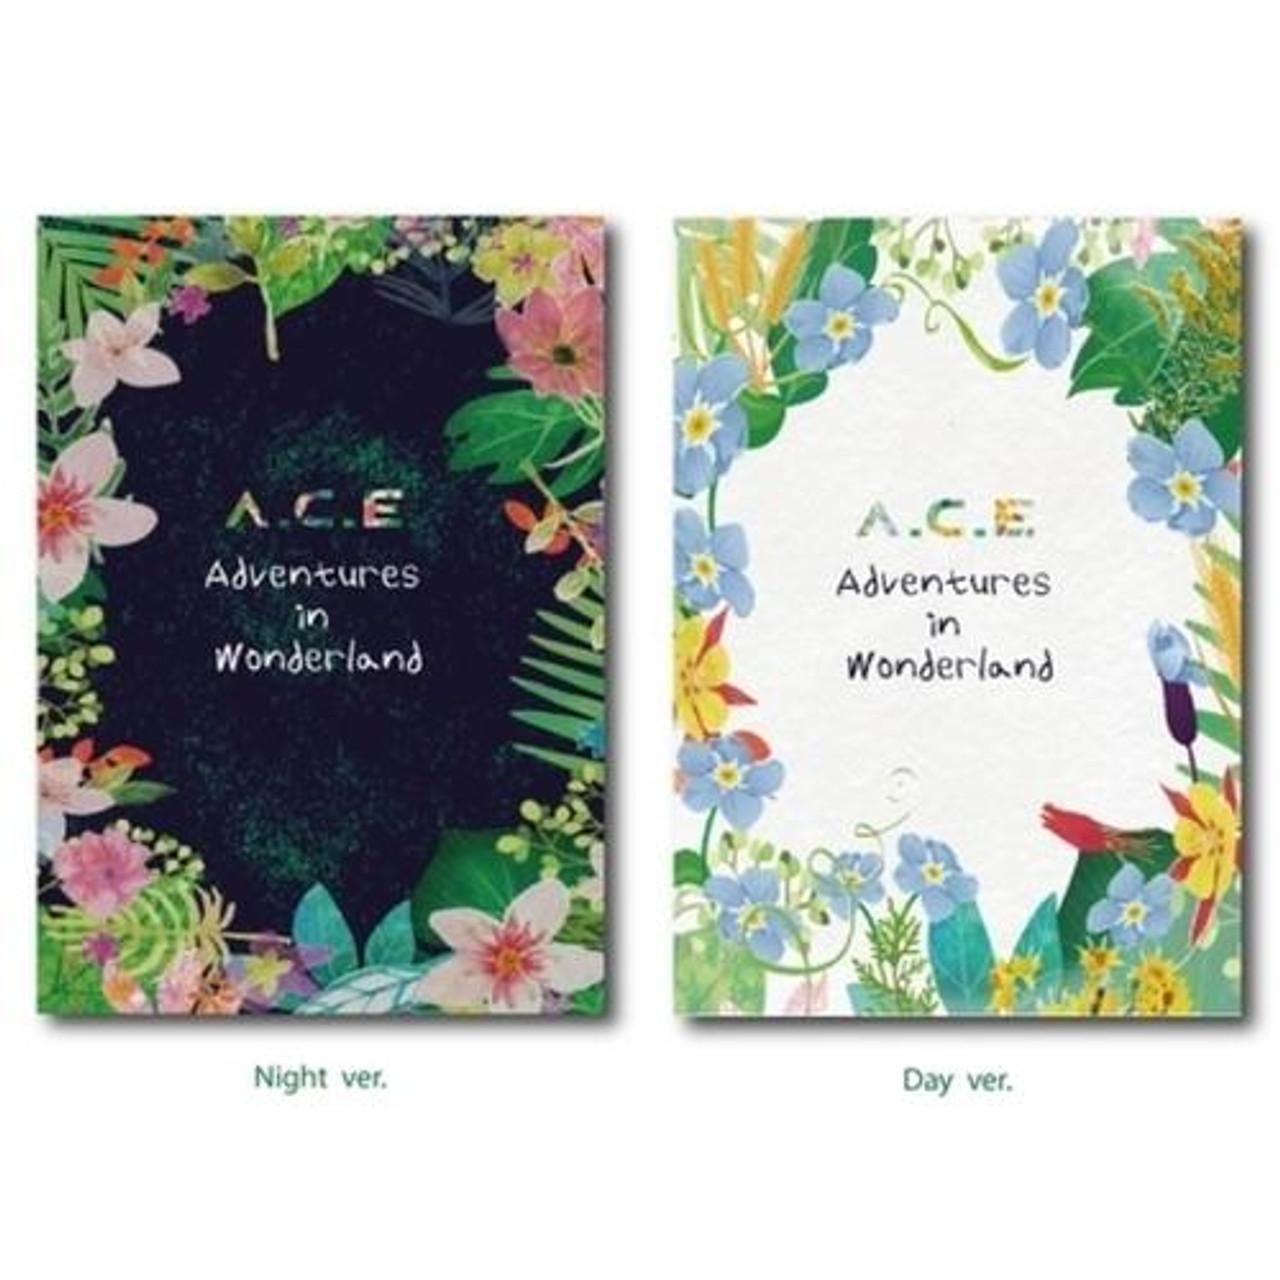 A.C.E - Repackage [ADVENTURES IN WONDERLAND] (NIGHT/ DAY Random)